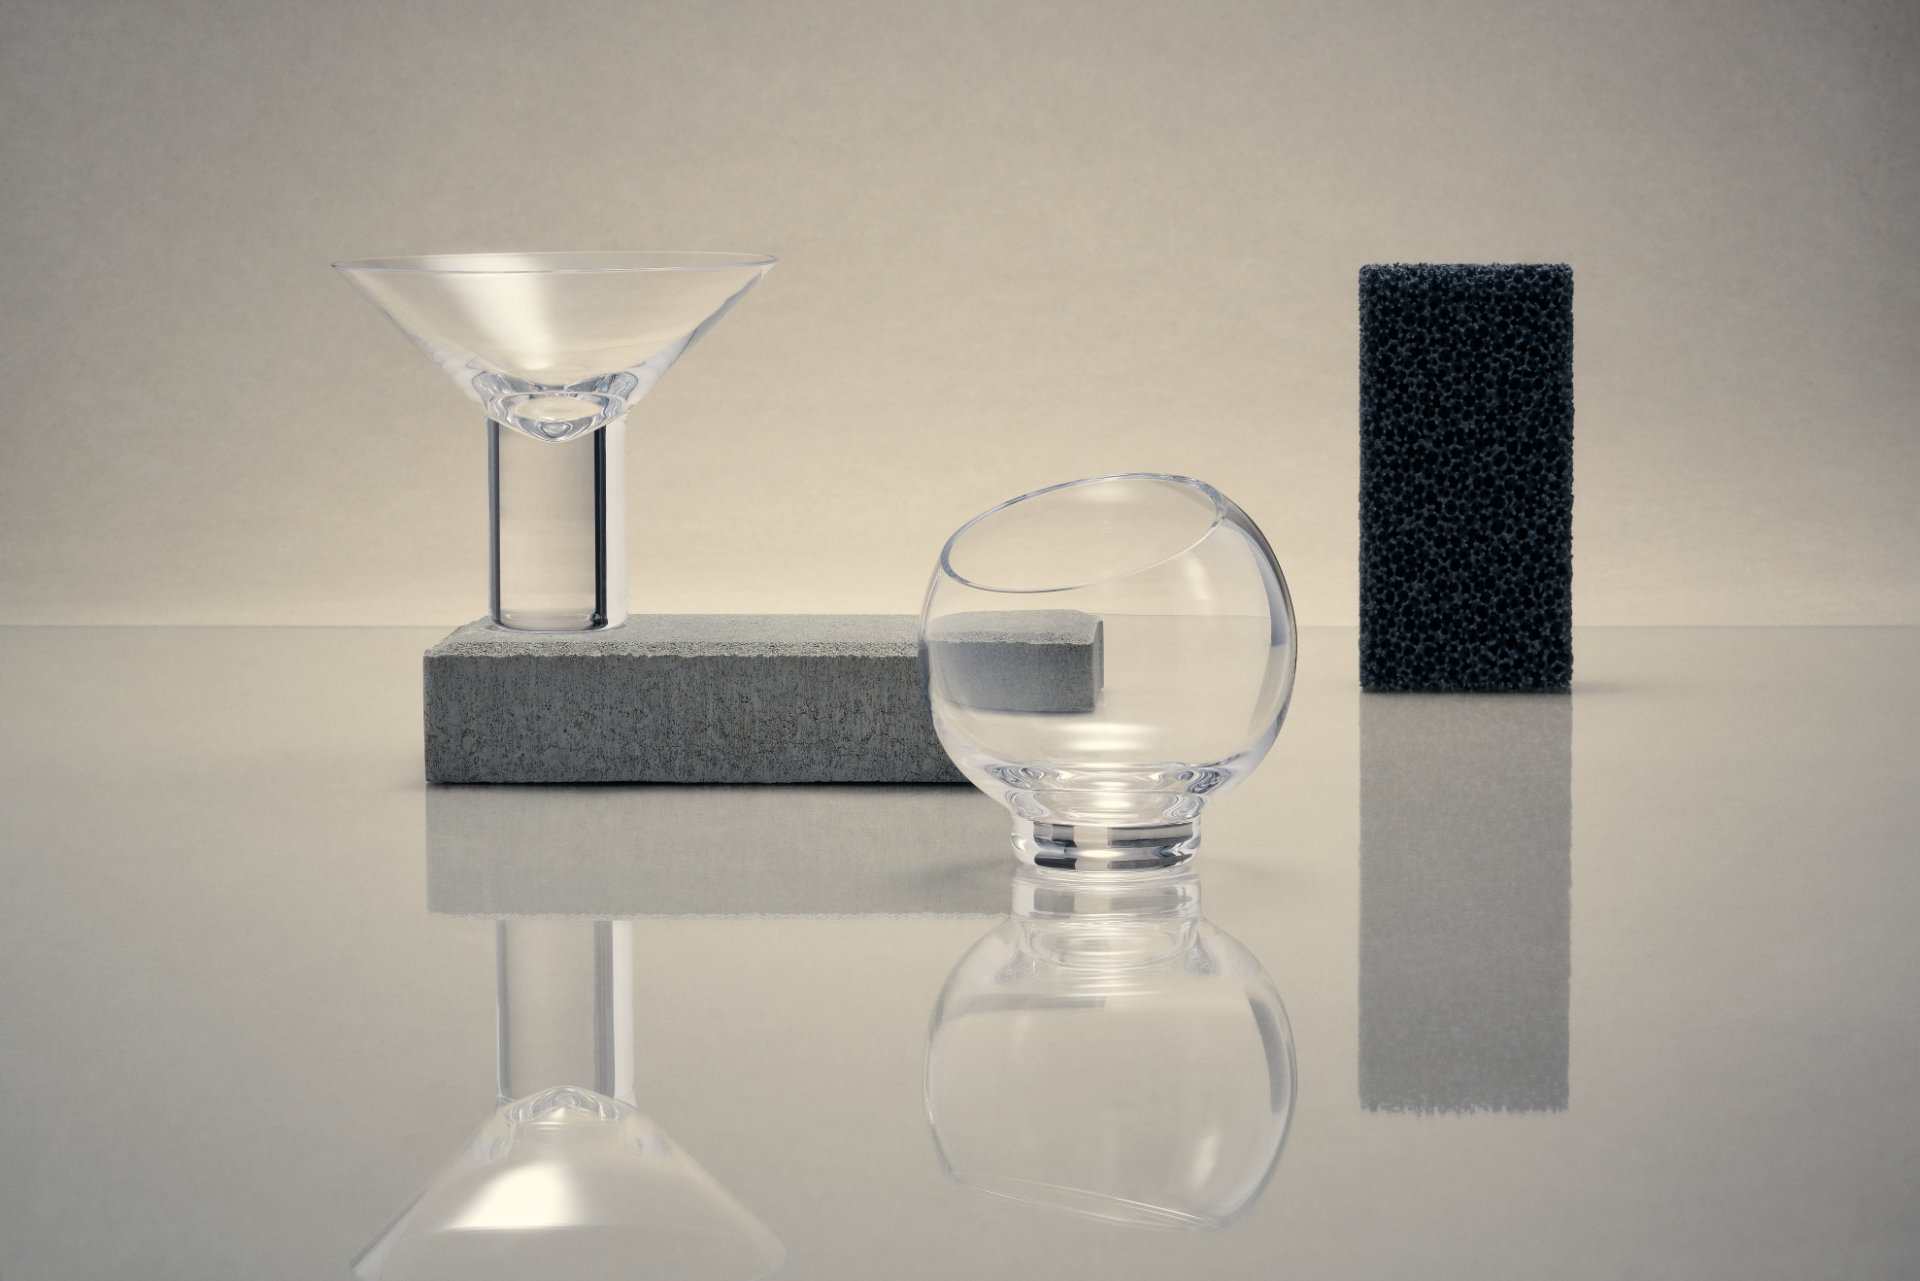 BrandDoctor | 2 choices: take a sip of LUCK or do you Primitivo? 7